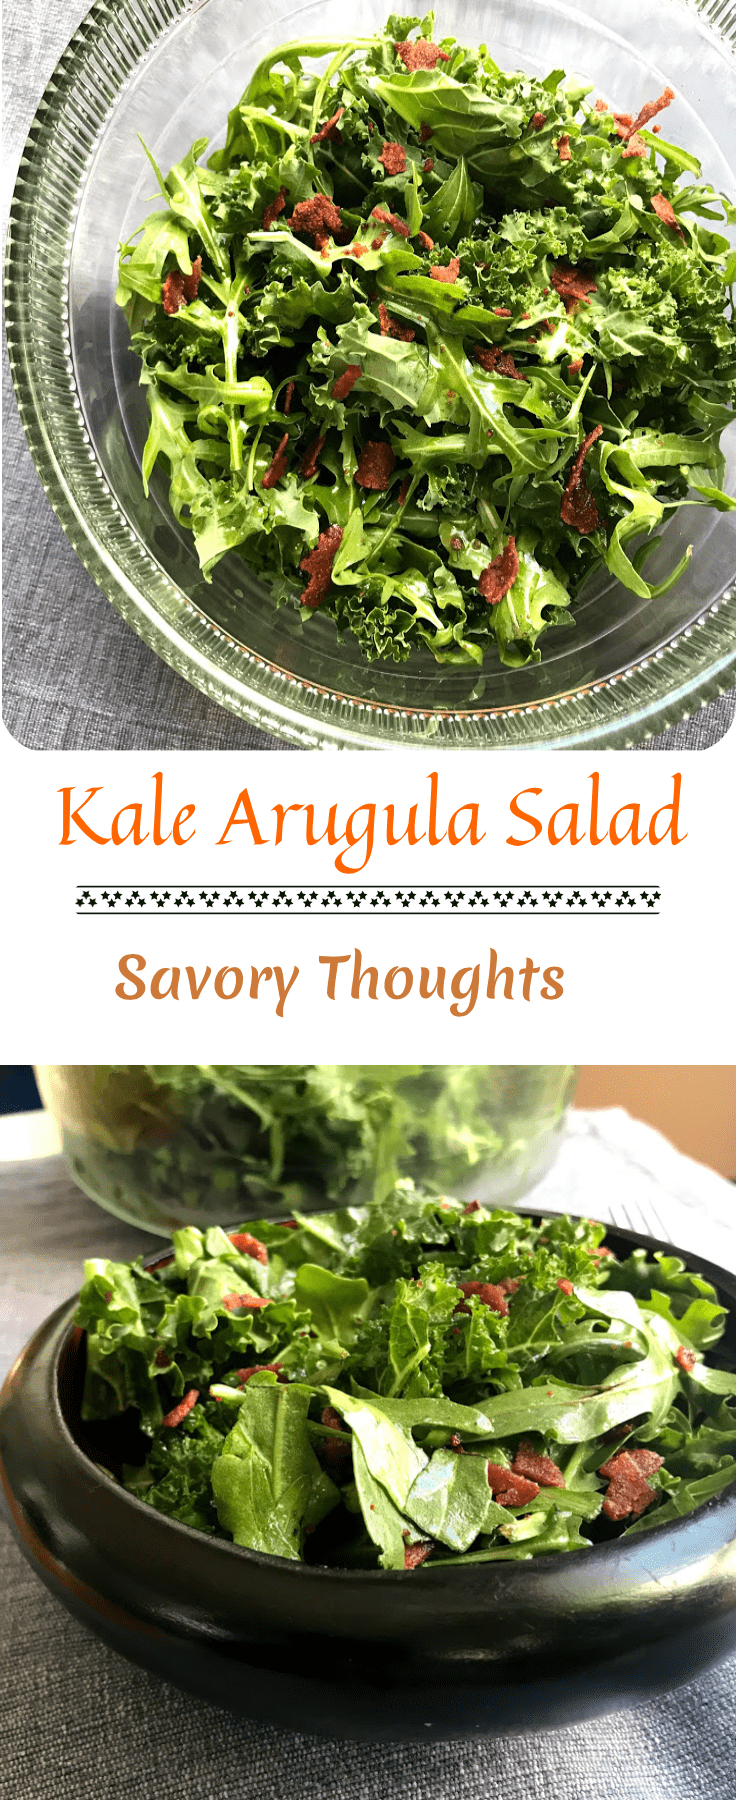 Kale Arugula Salad. #Recipes #Easyrecipes #Arugulasalad